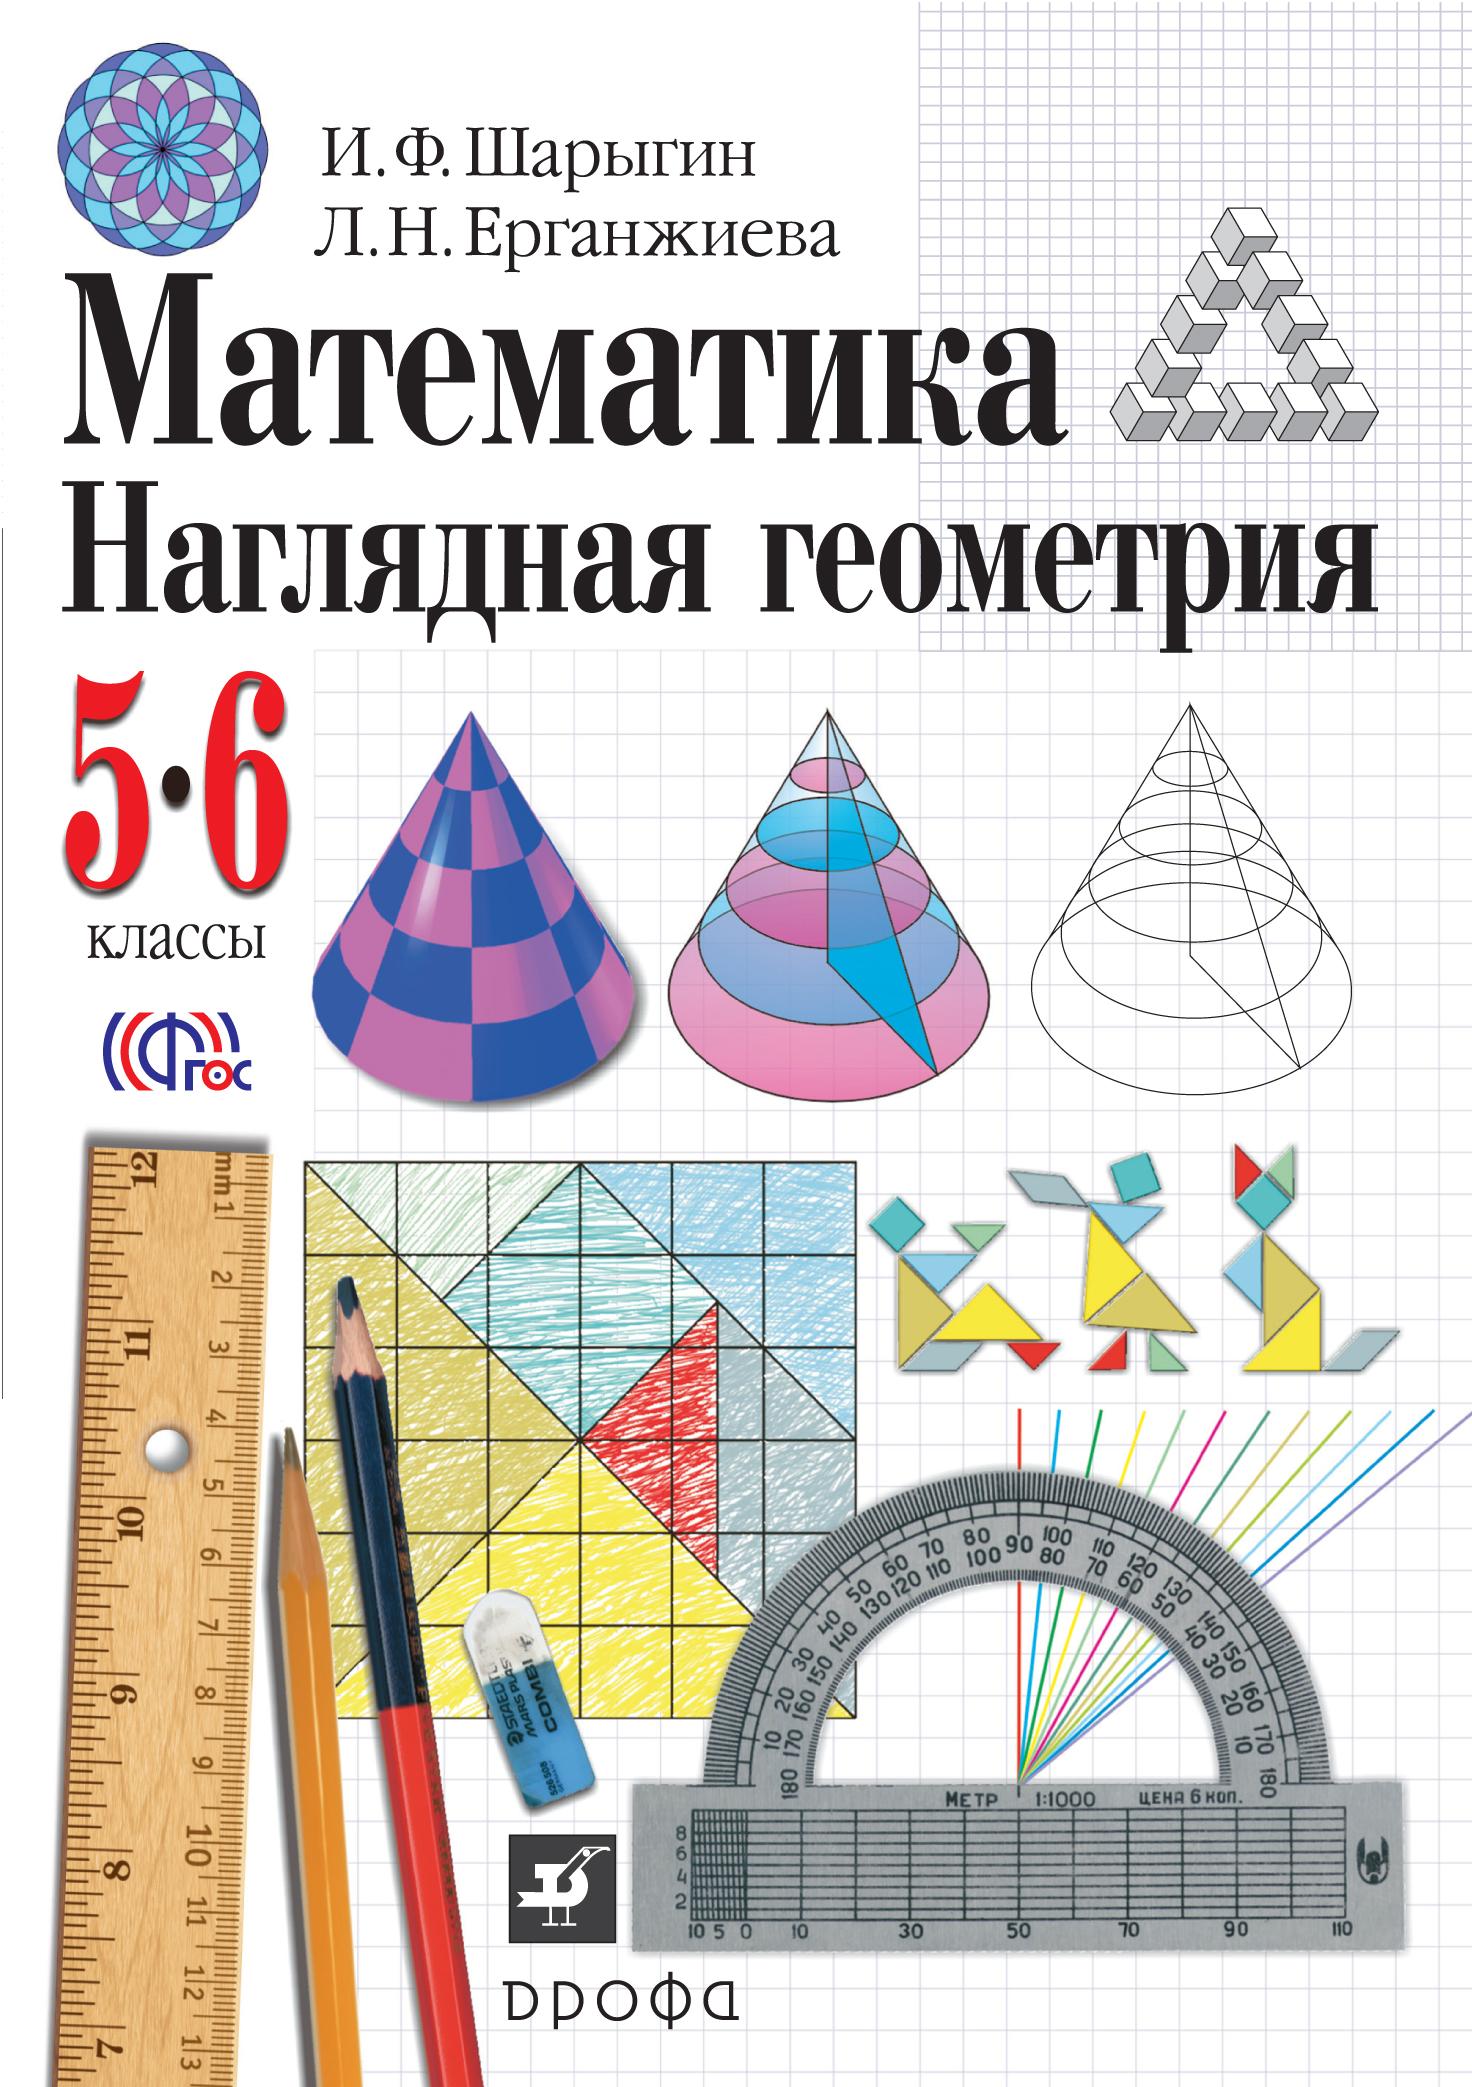 Наглядная геометрия 5-6кл [Учебник] ФП